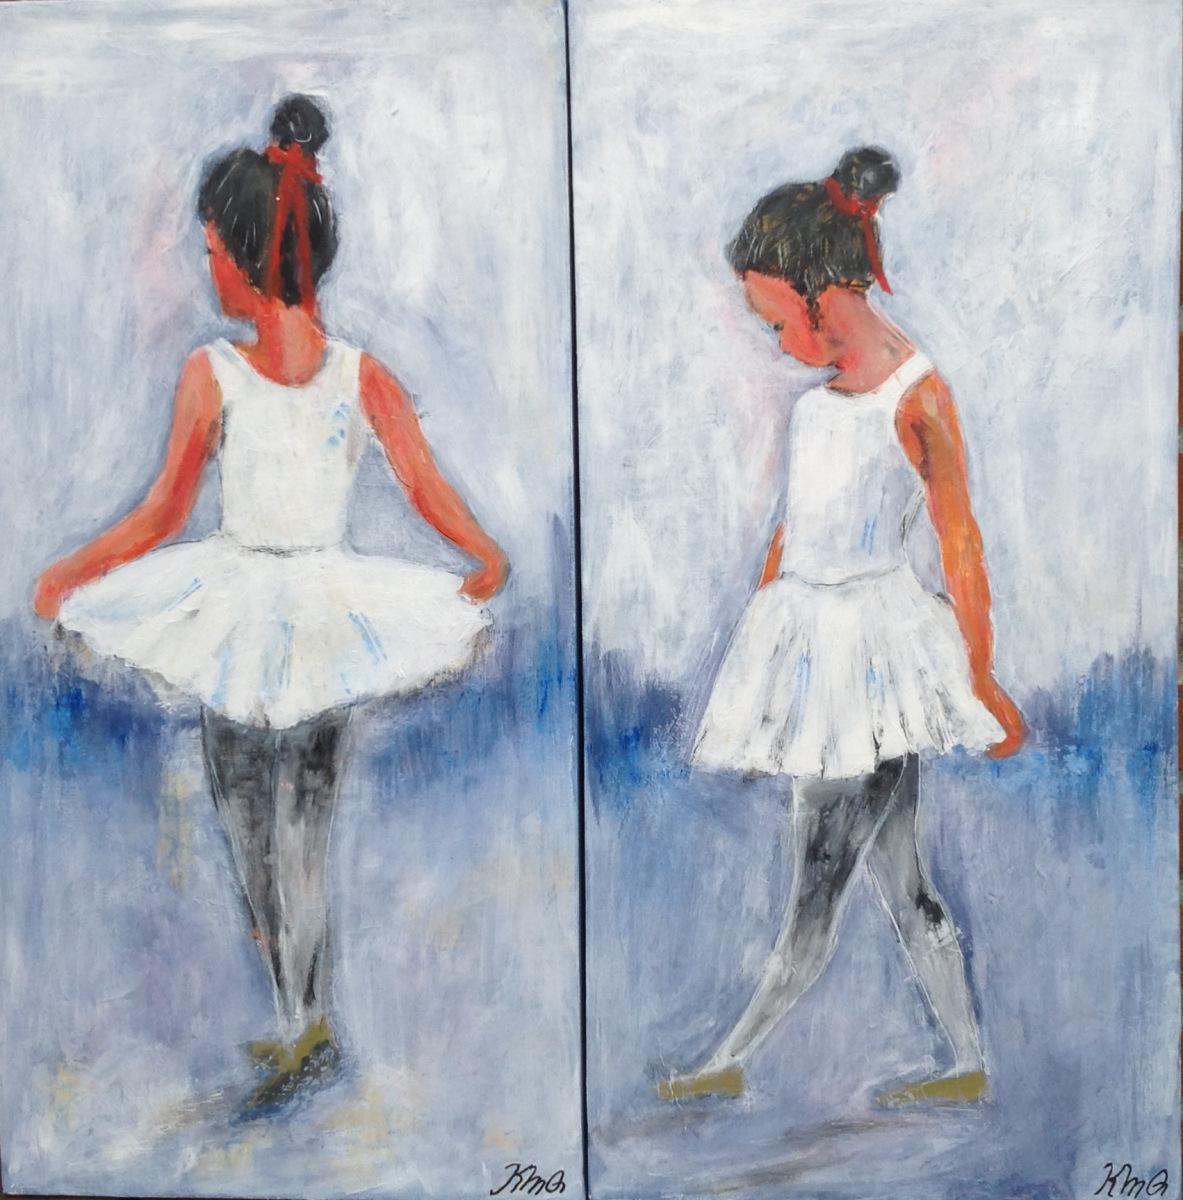 Balletpige 35 x 70 cm